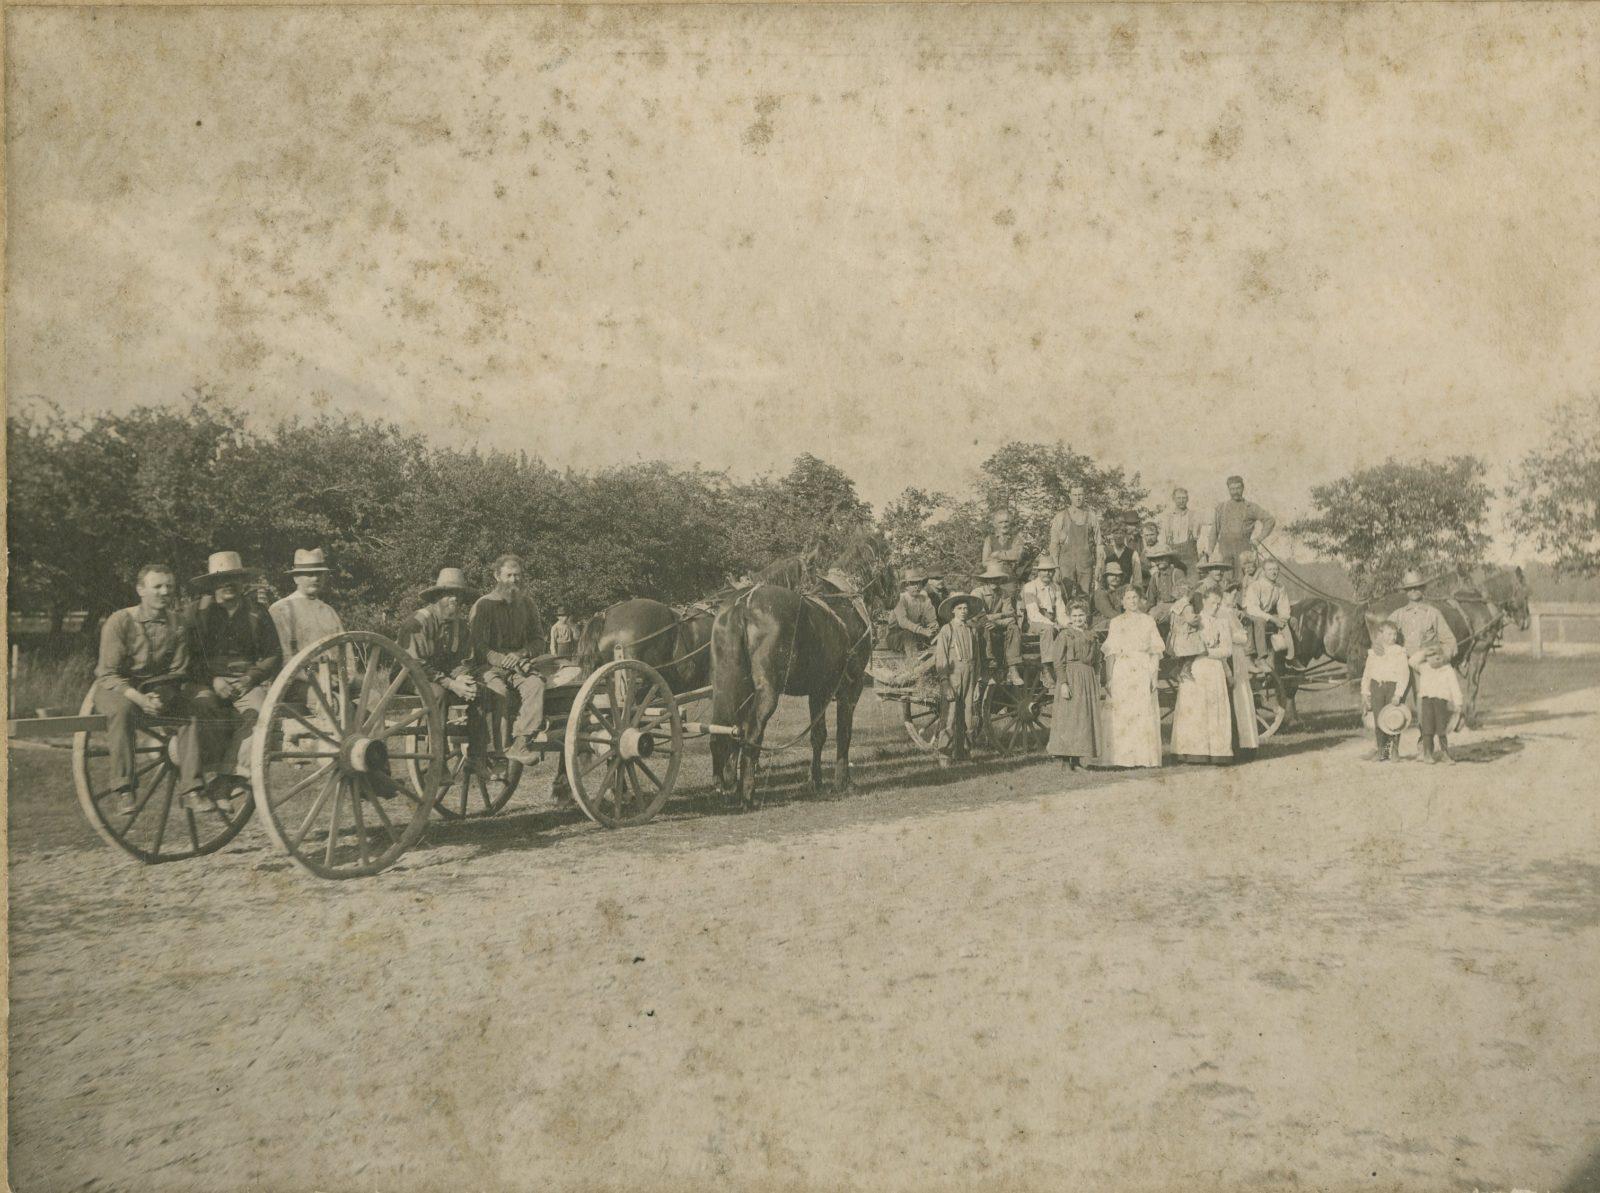 Snowden Farm, c. 1900-1910